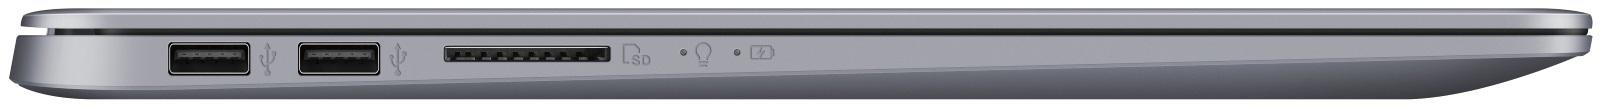 "ASUS VivoBook 15.6"" Laptop | Intel Core i5 | NVIDIA MX130 | 8GB RAM + 512GB SSD | image"